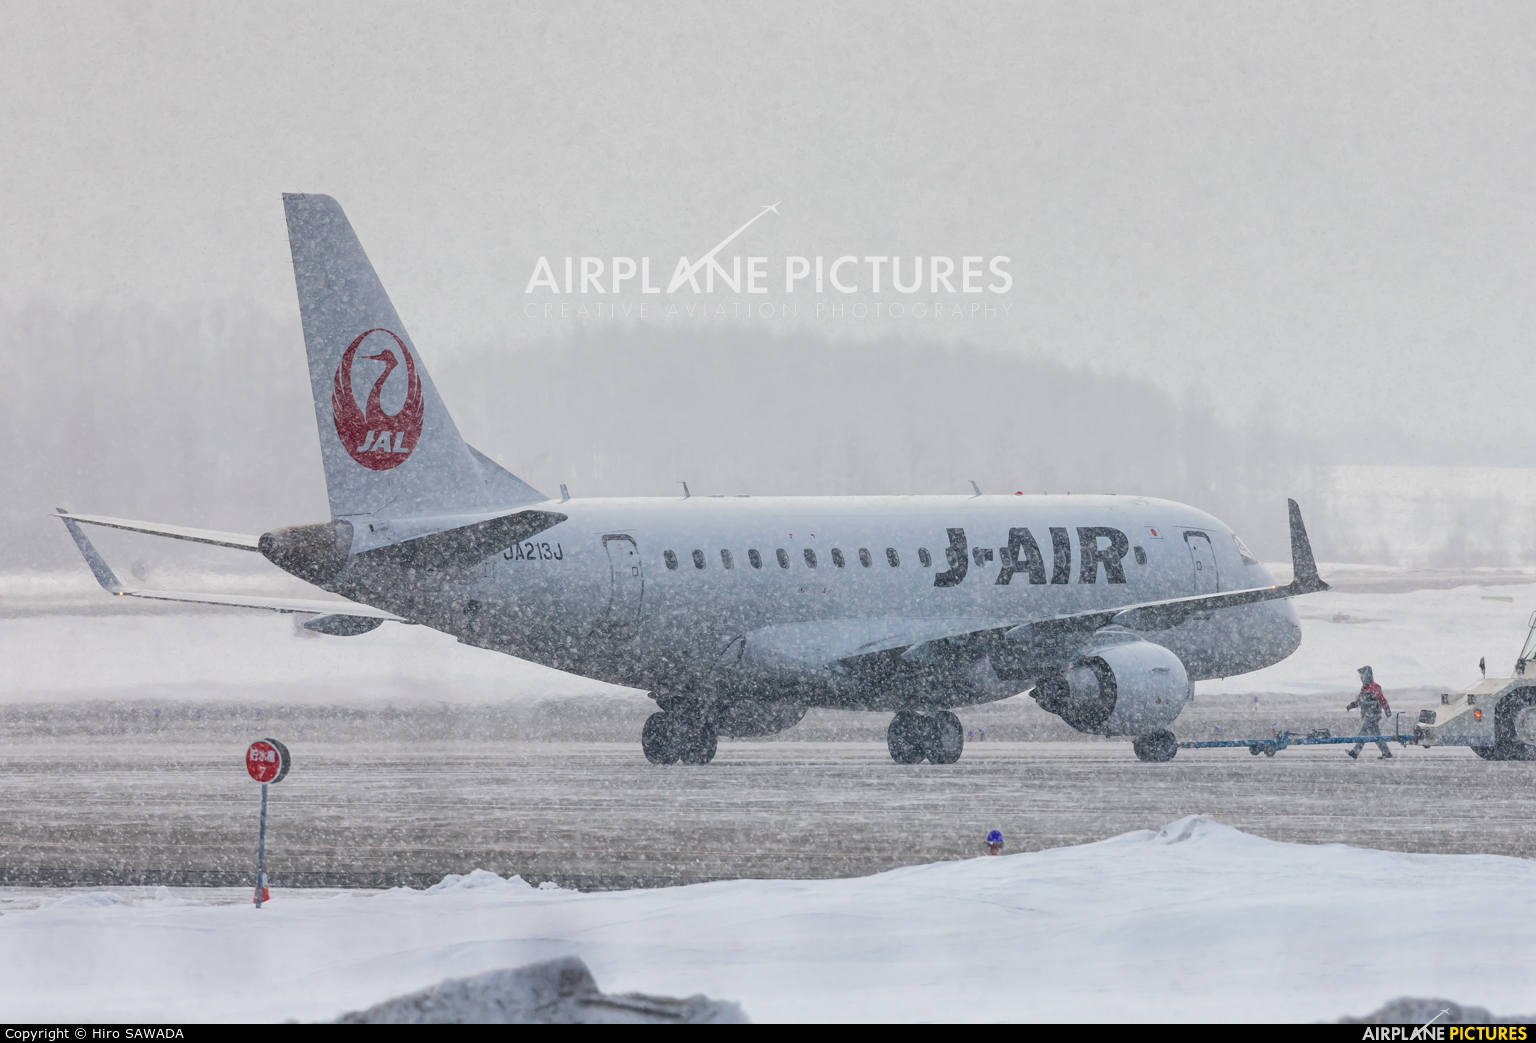 J-Air JA213J aircraft at Memanbetsu